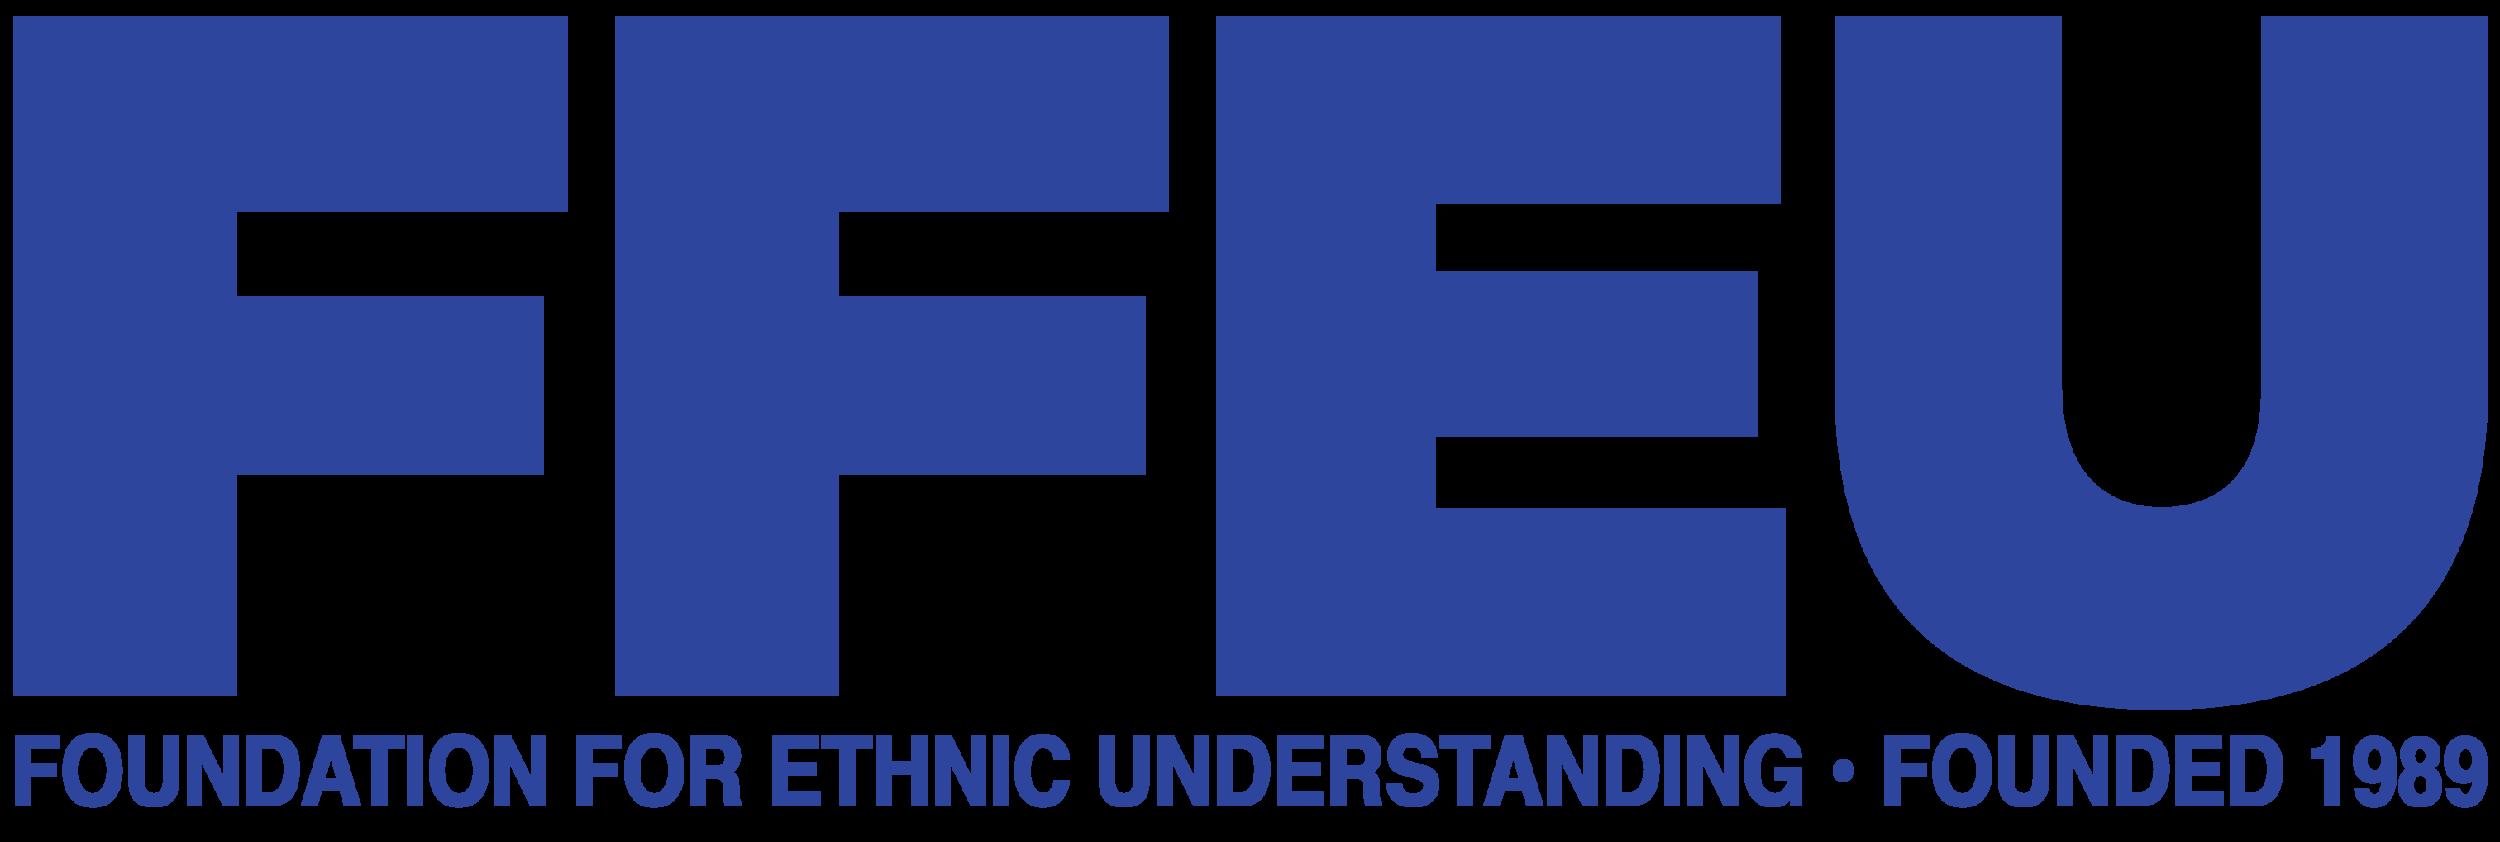 ffeu_logo.png